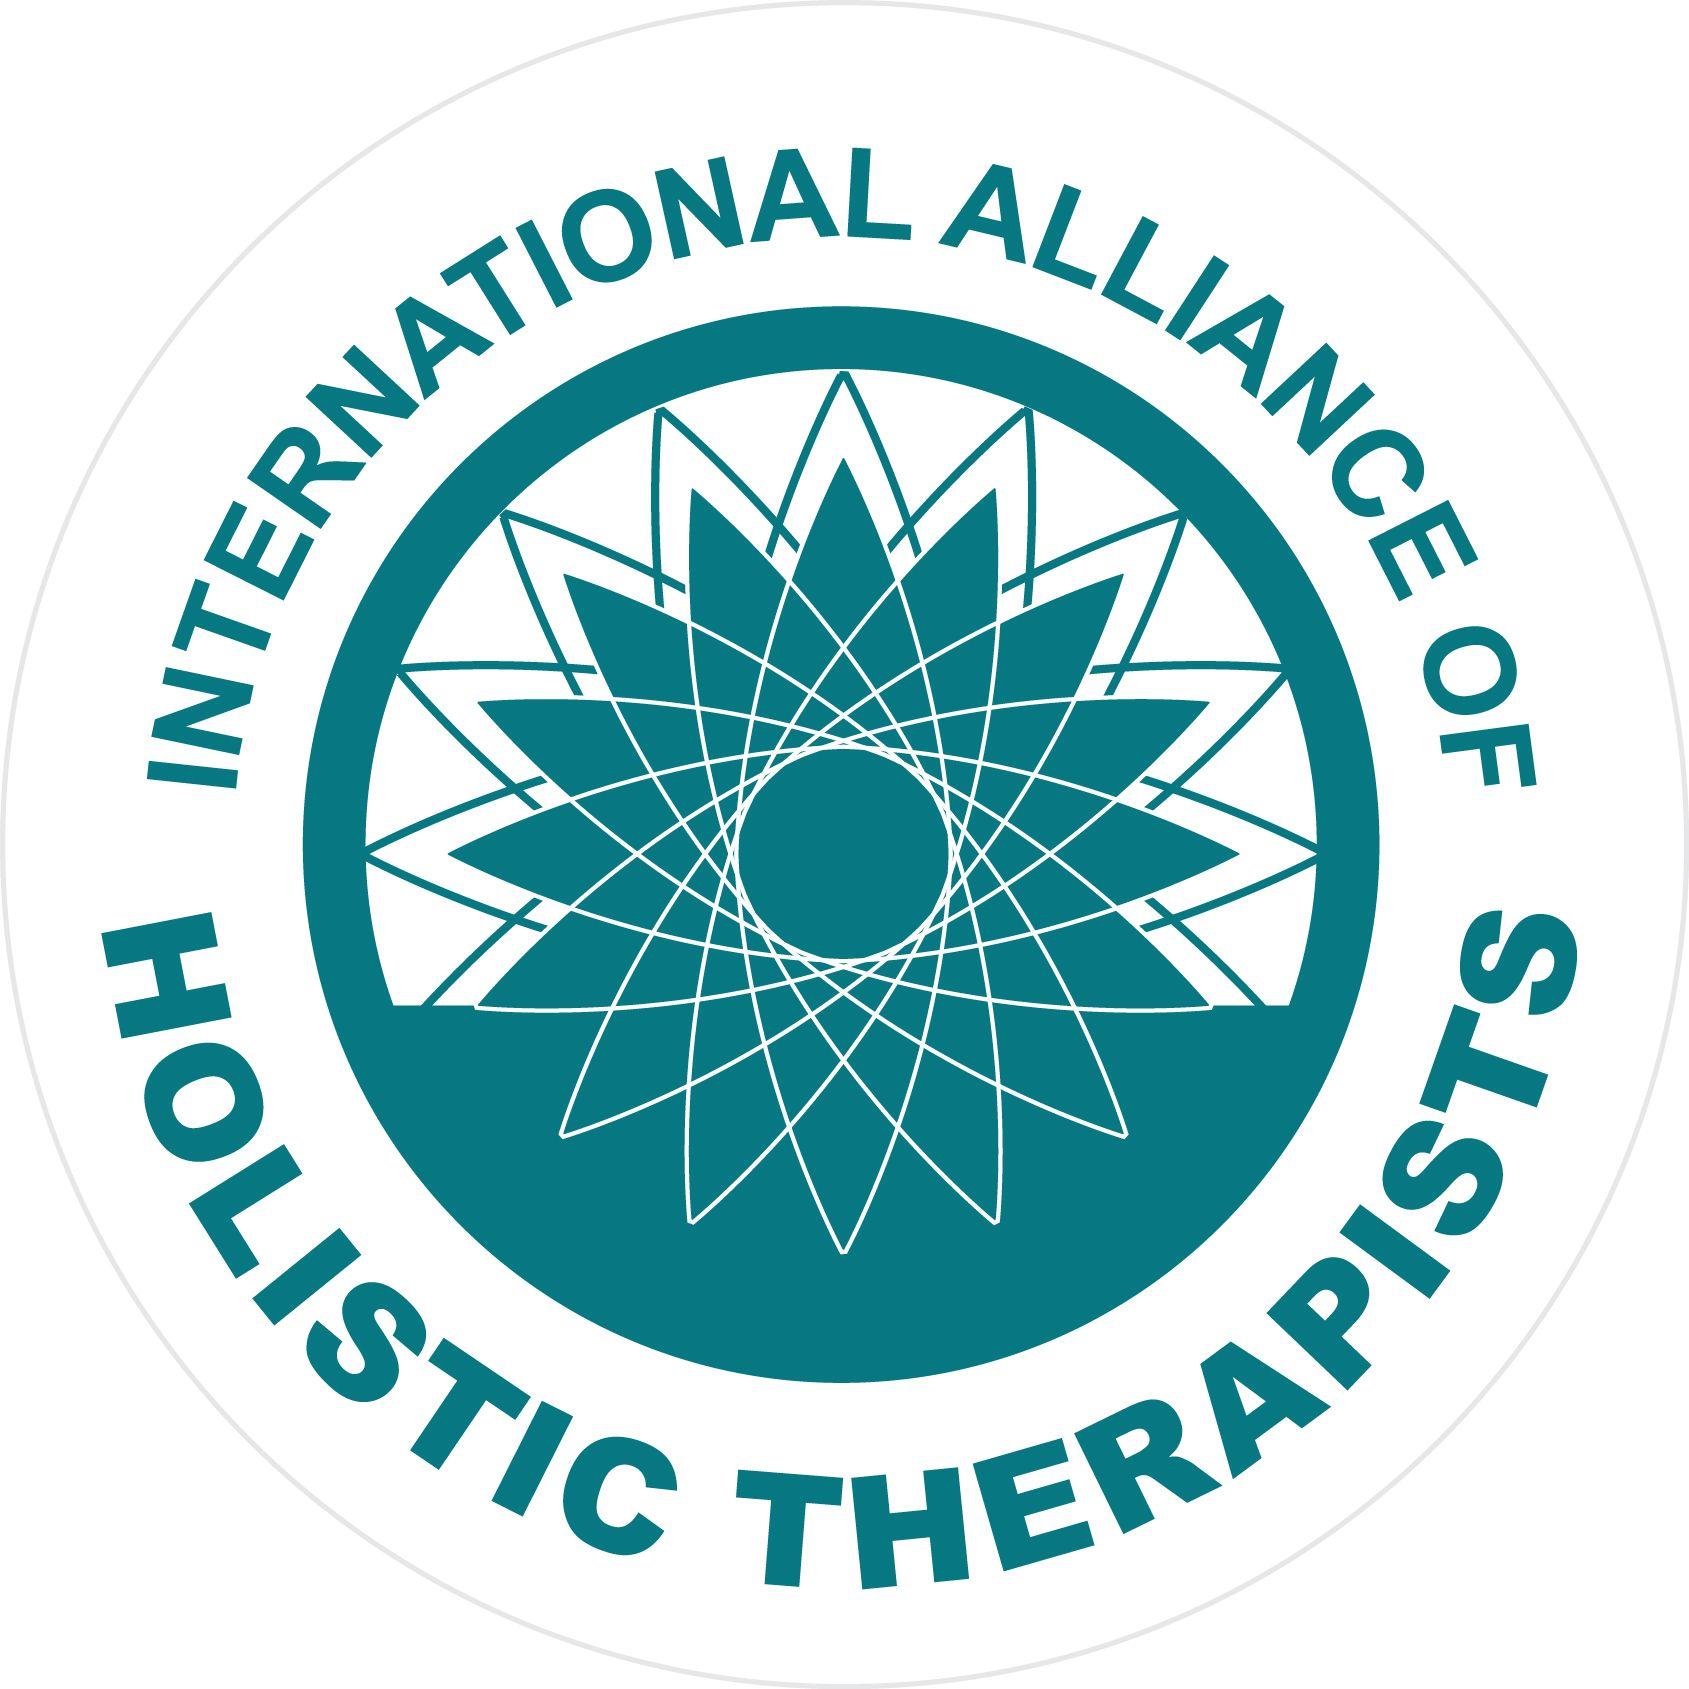 international-alliance-of-holistic-therapists-logo